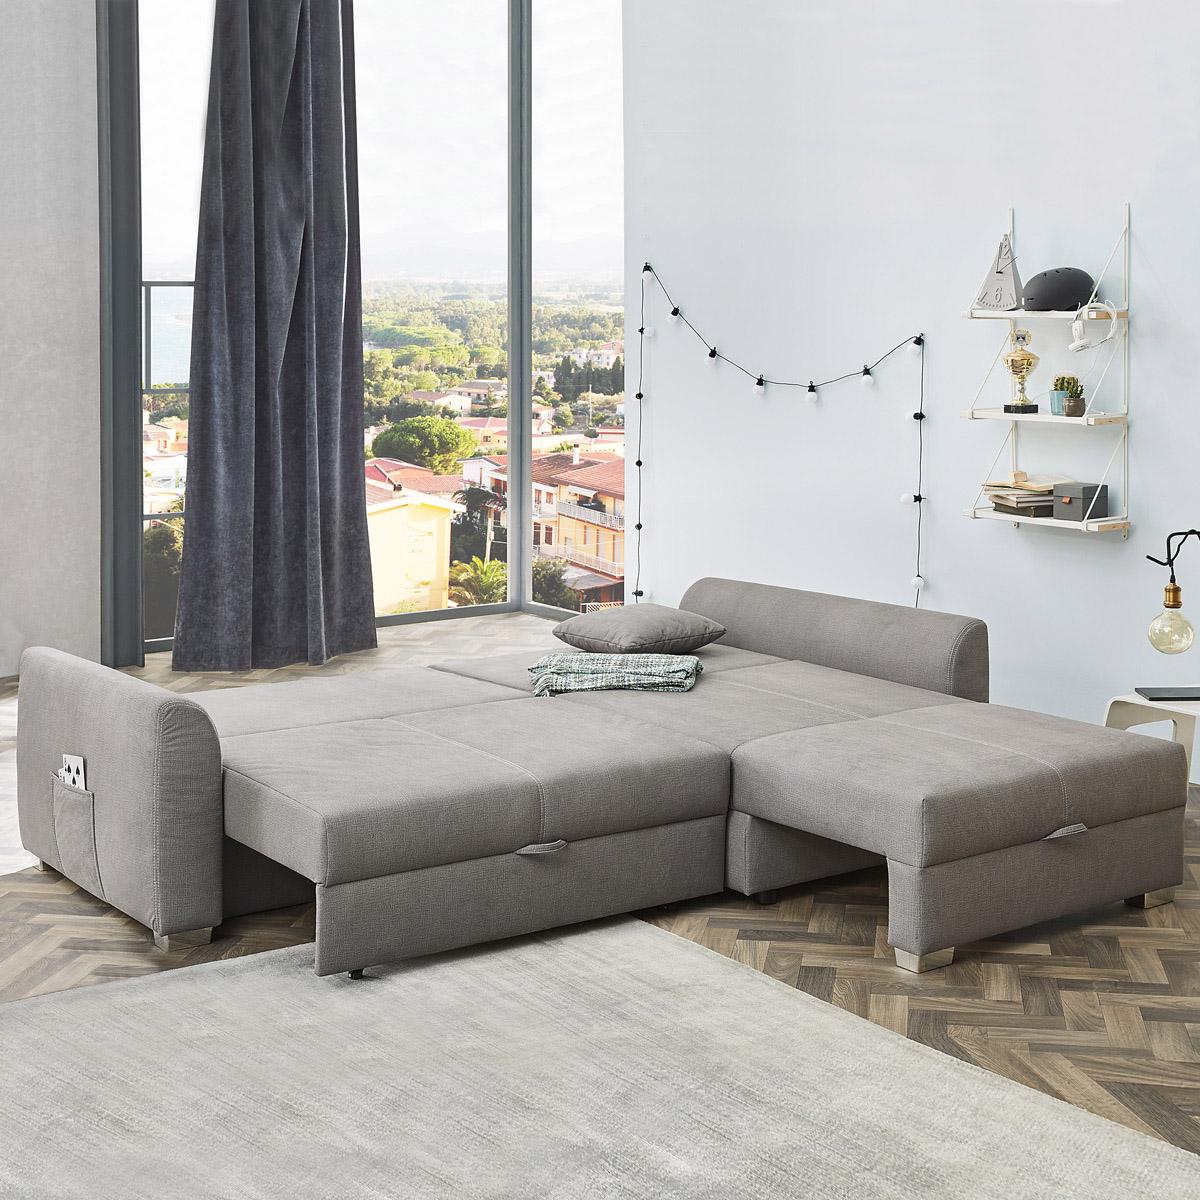 Ecksofa mit Doppel-Gästebettfunktion – Liegefläche